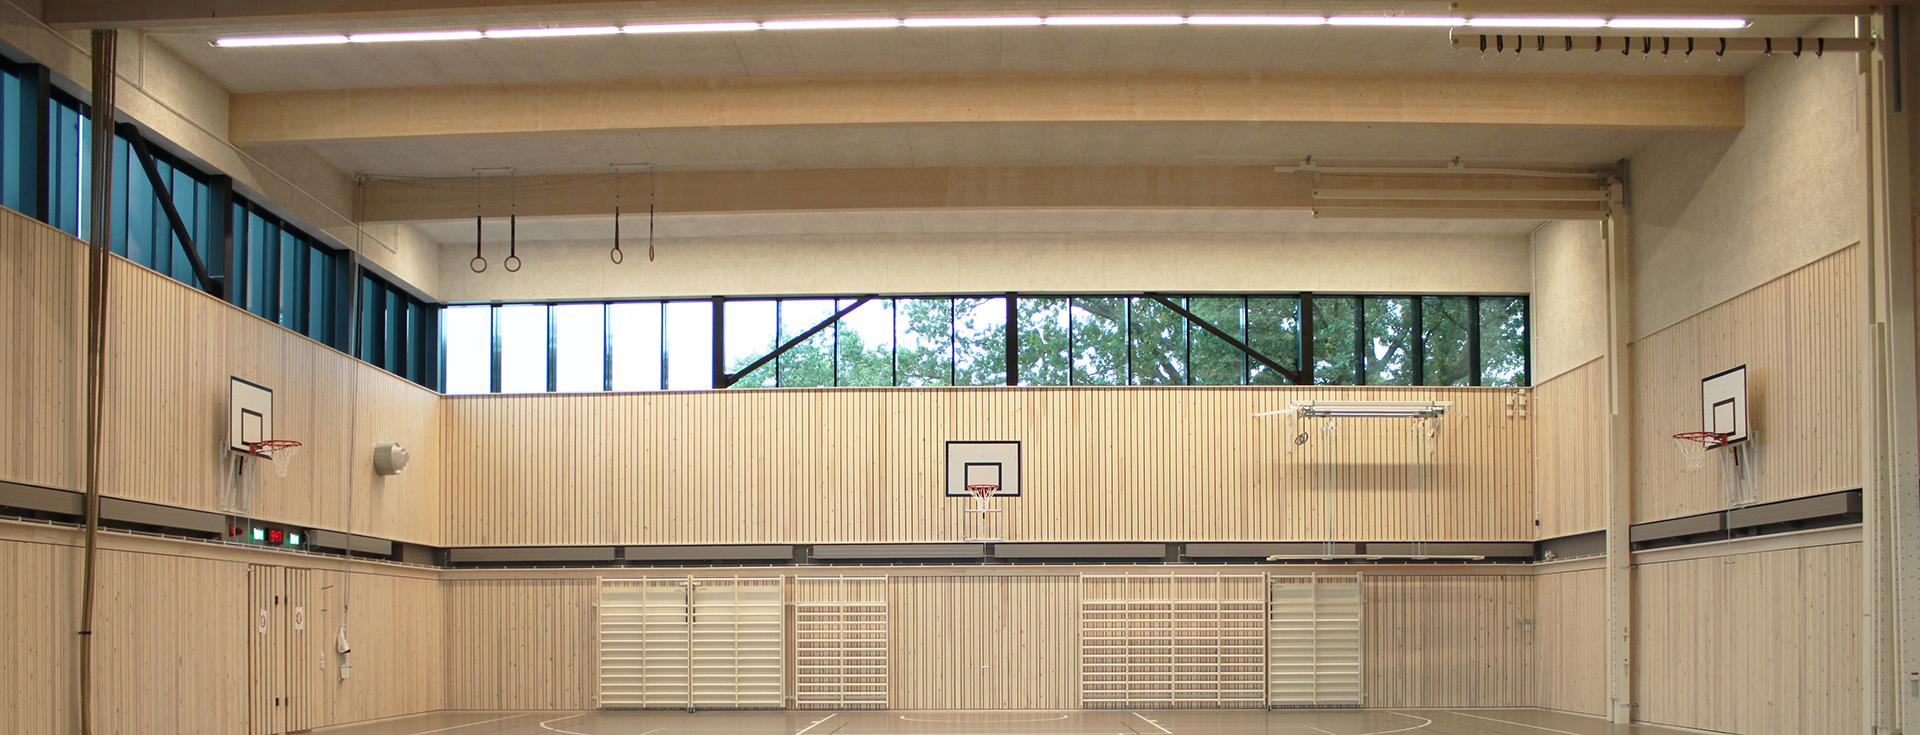 Johan-Skyttesskolan-idrottshall-1920-735